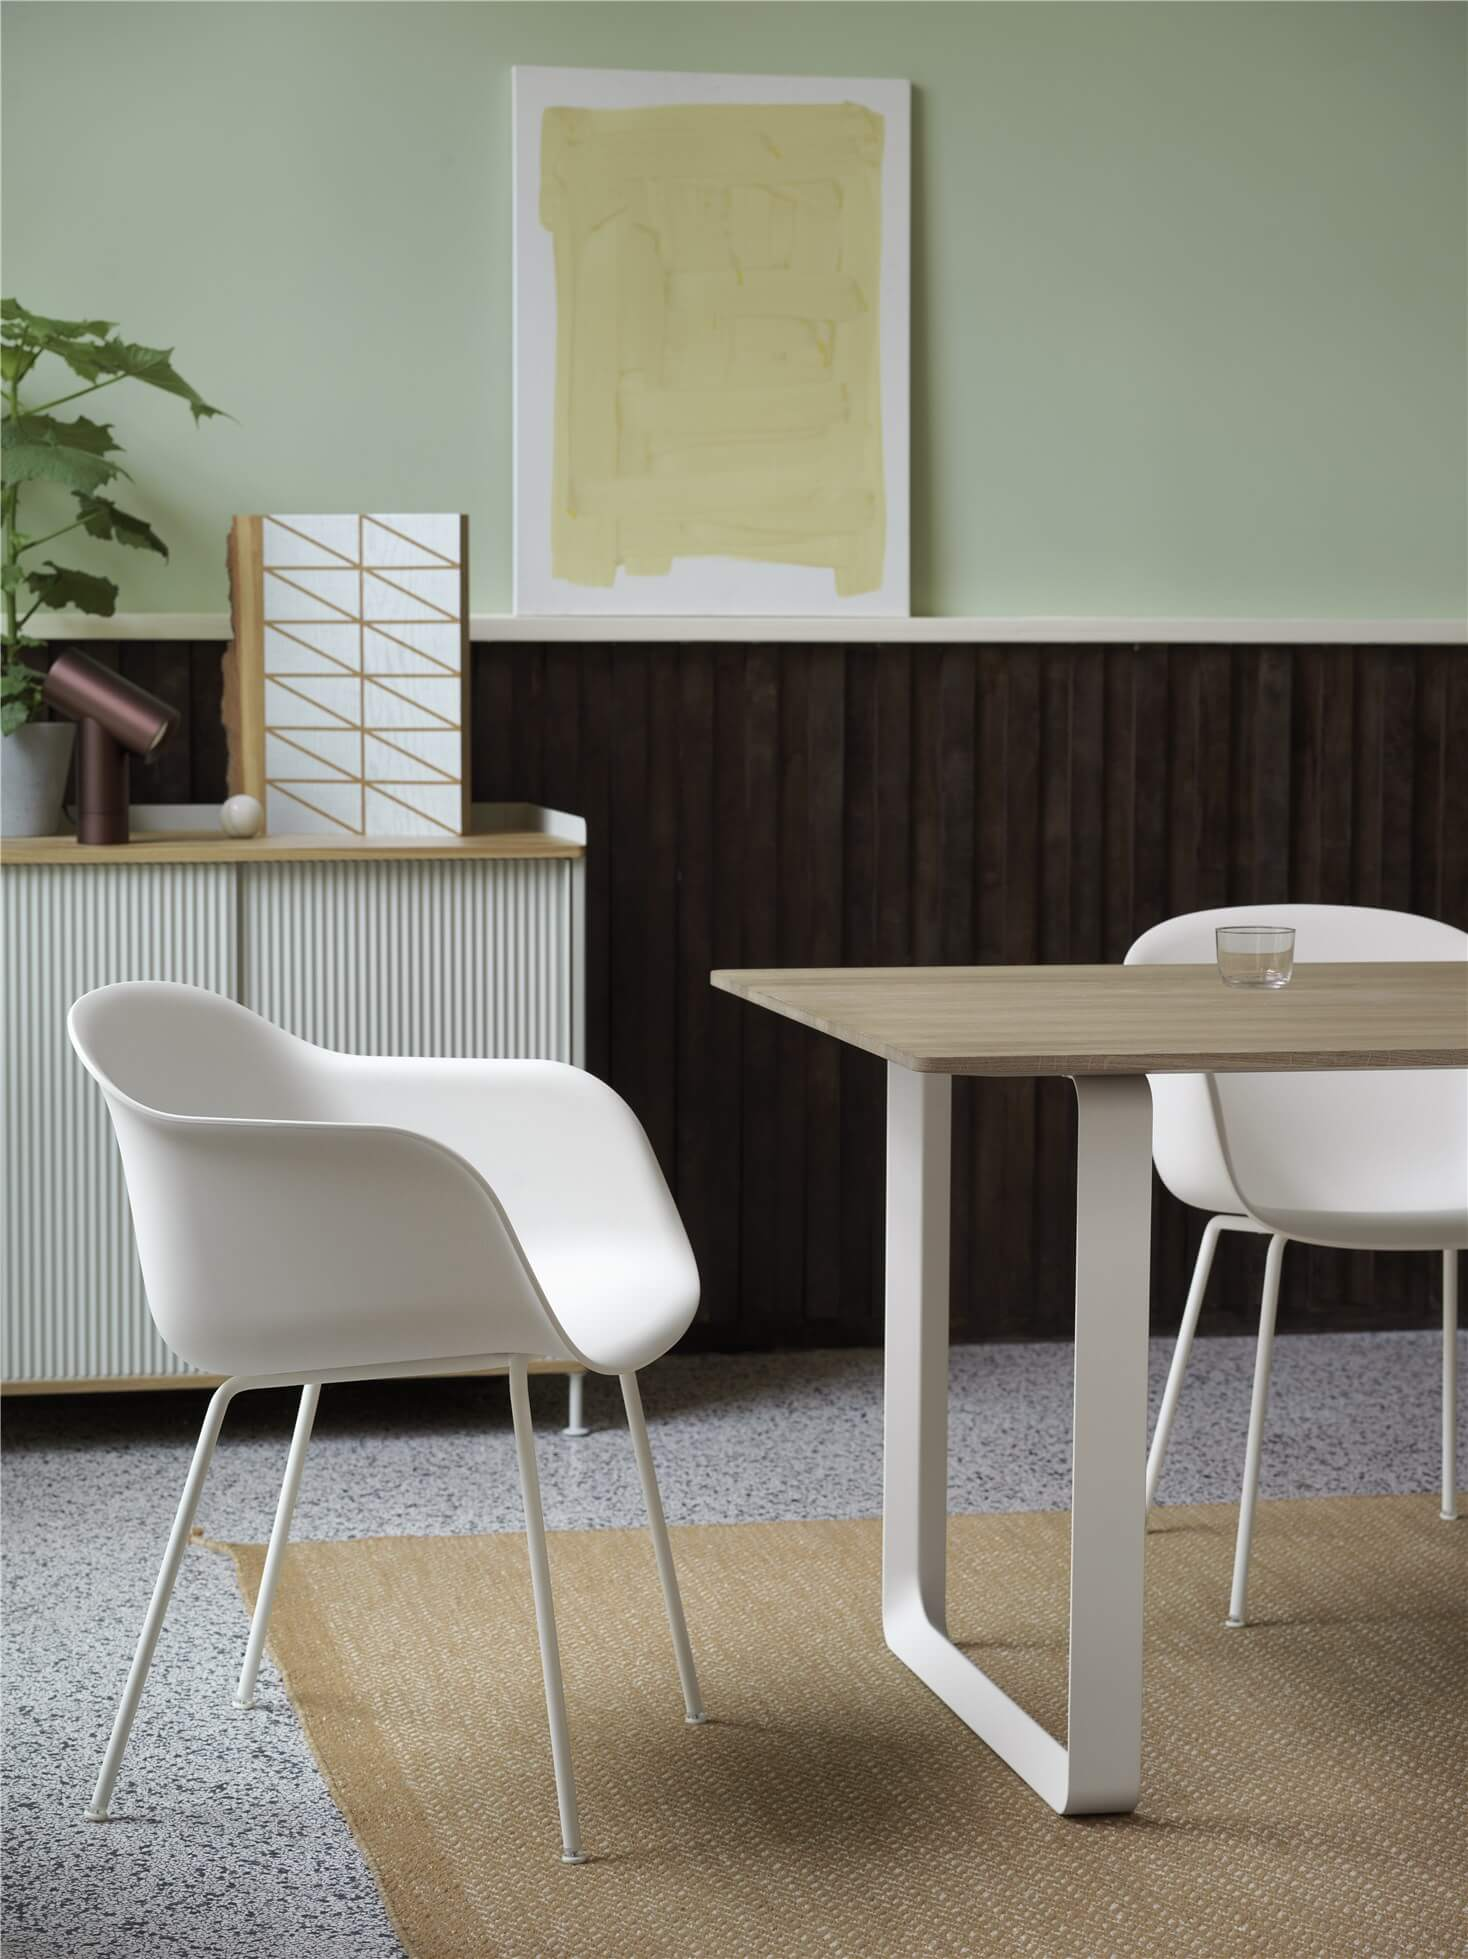 Fiber-armchair-tube-white-70-70-solid-oak-ply-rug-burnt-orange-enfold-grey-beam-muuto-org